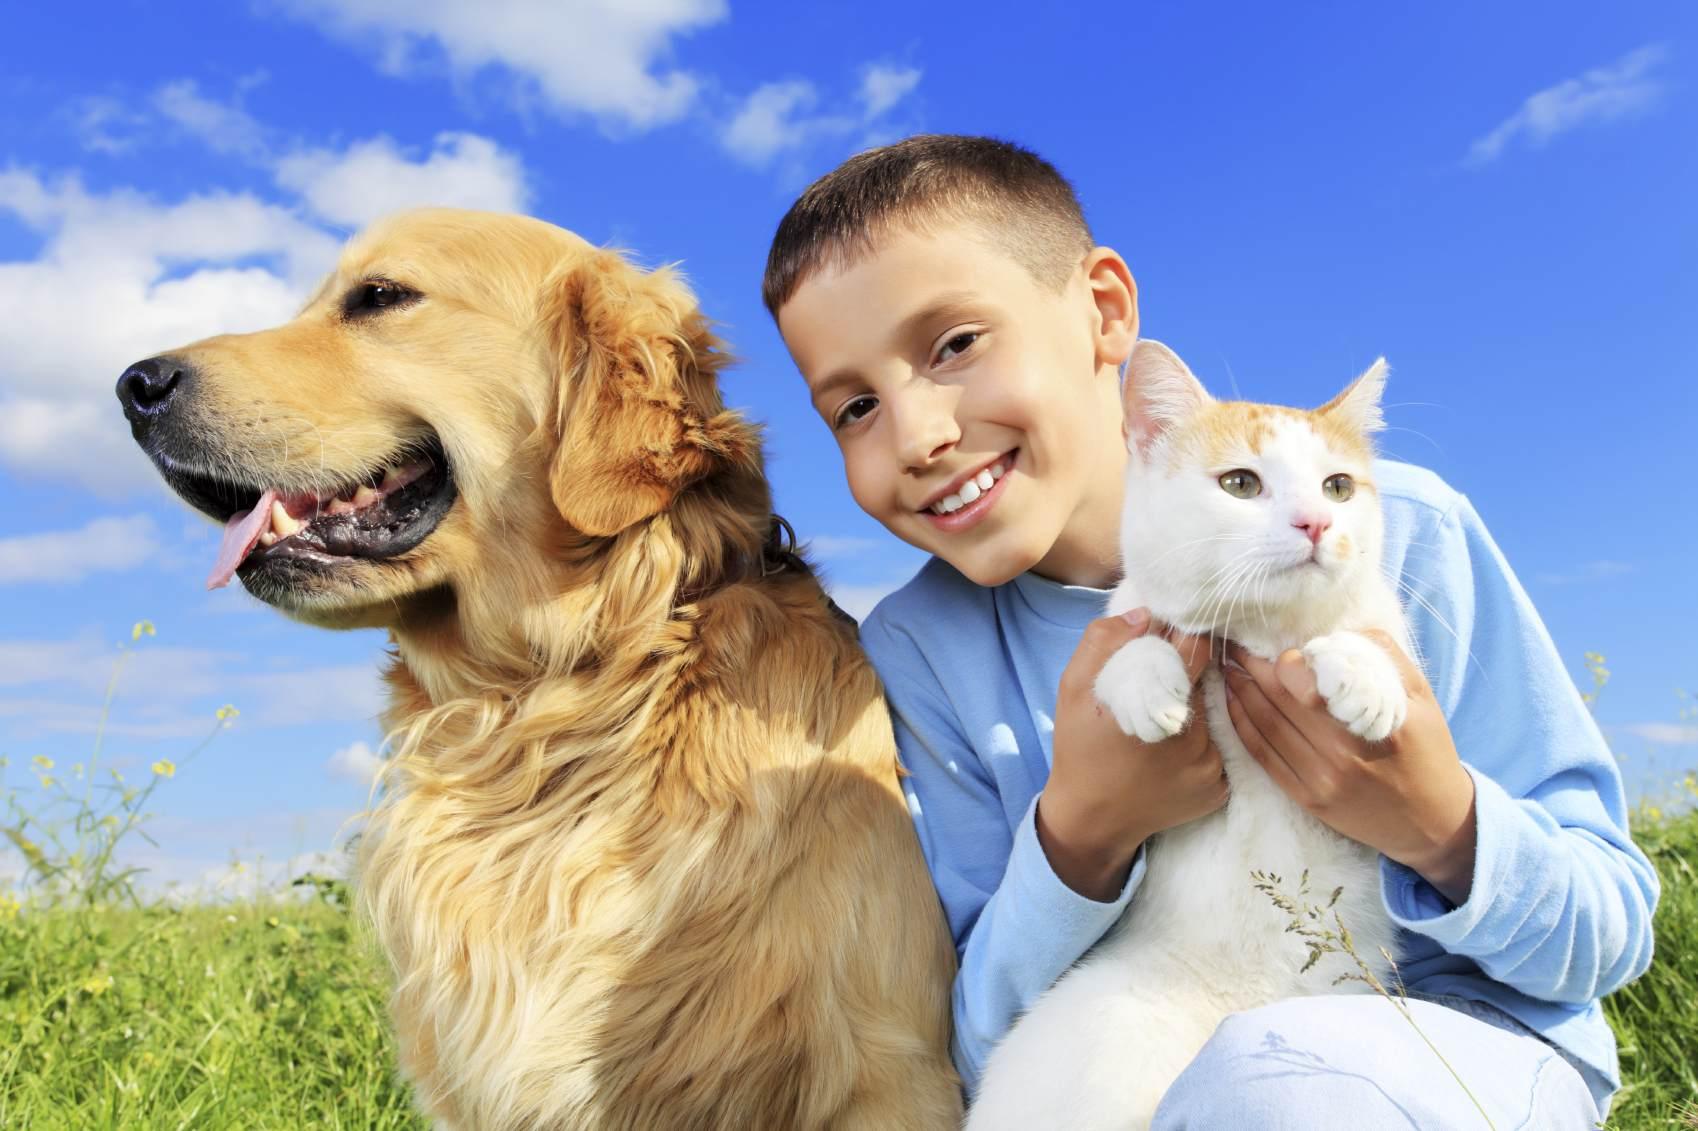 Cat and Dog Desktop Wallpaper 1698x1131